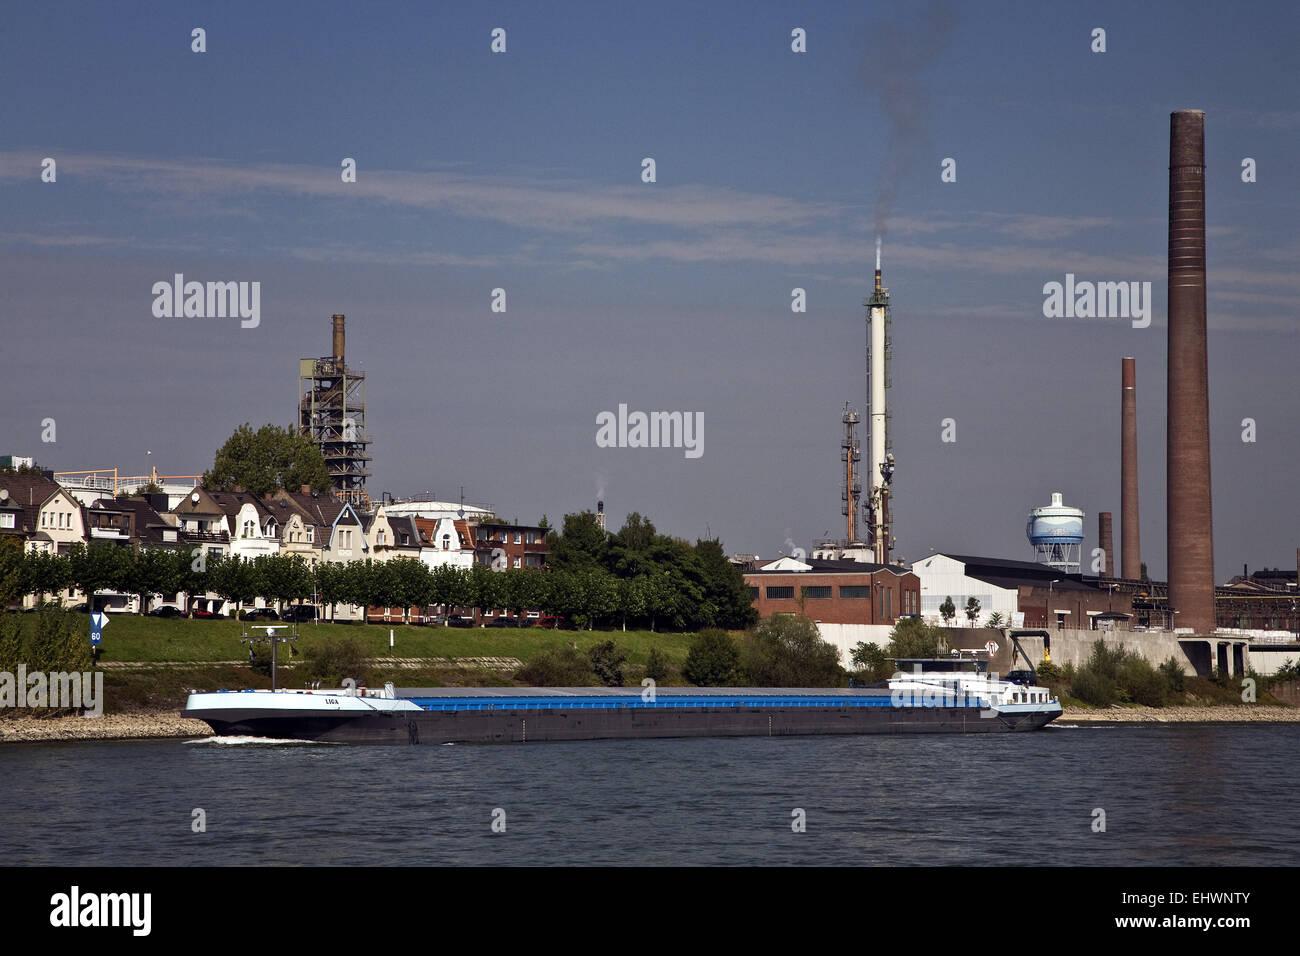 Cargo ship Rhein, Duisburg, Germany. - Stock Image